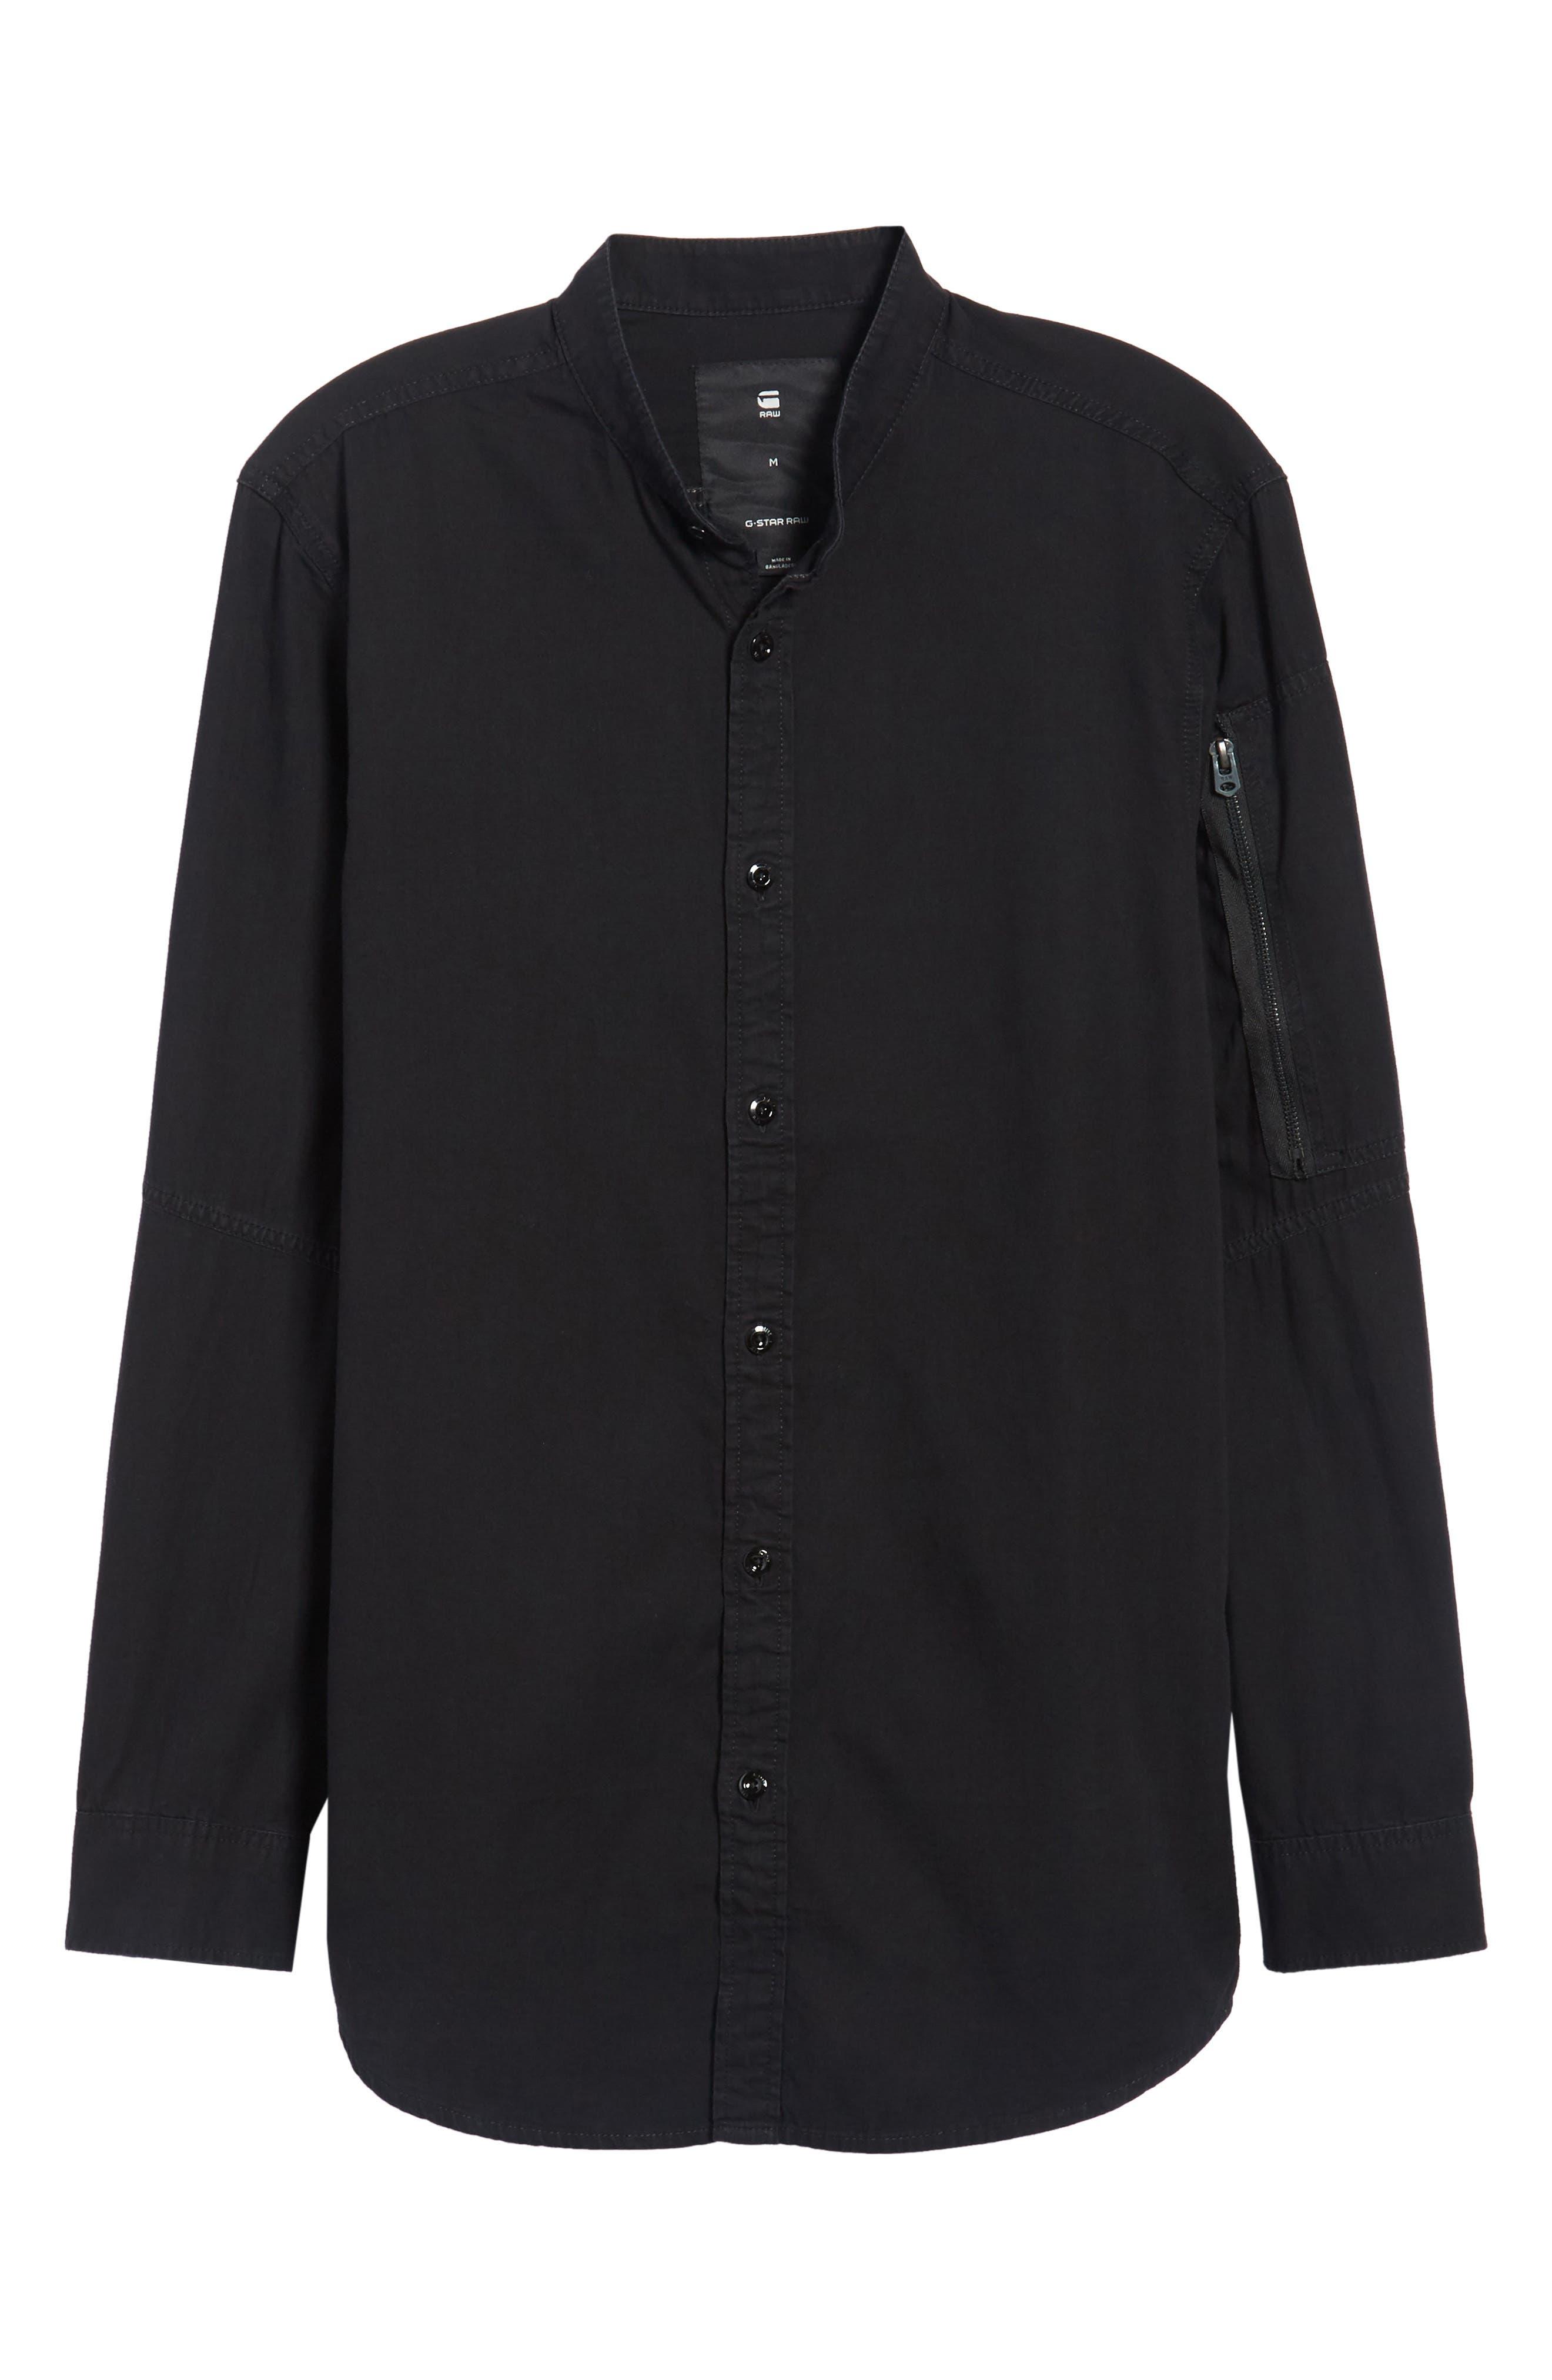 Stalt C-Less Shirt,                             Alternate thumbnail 6, color,                             001